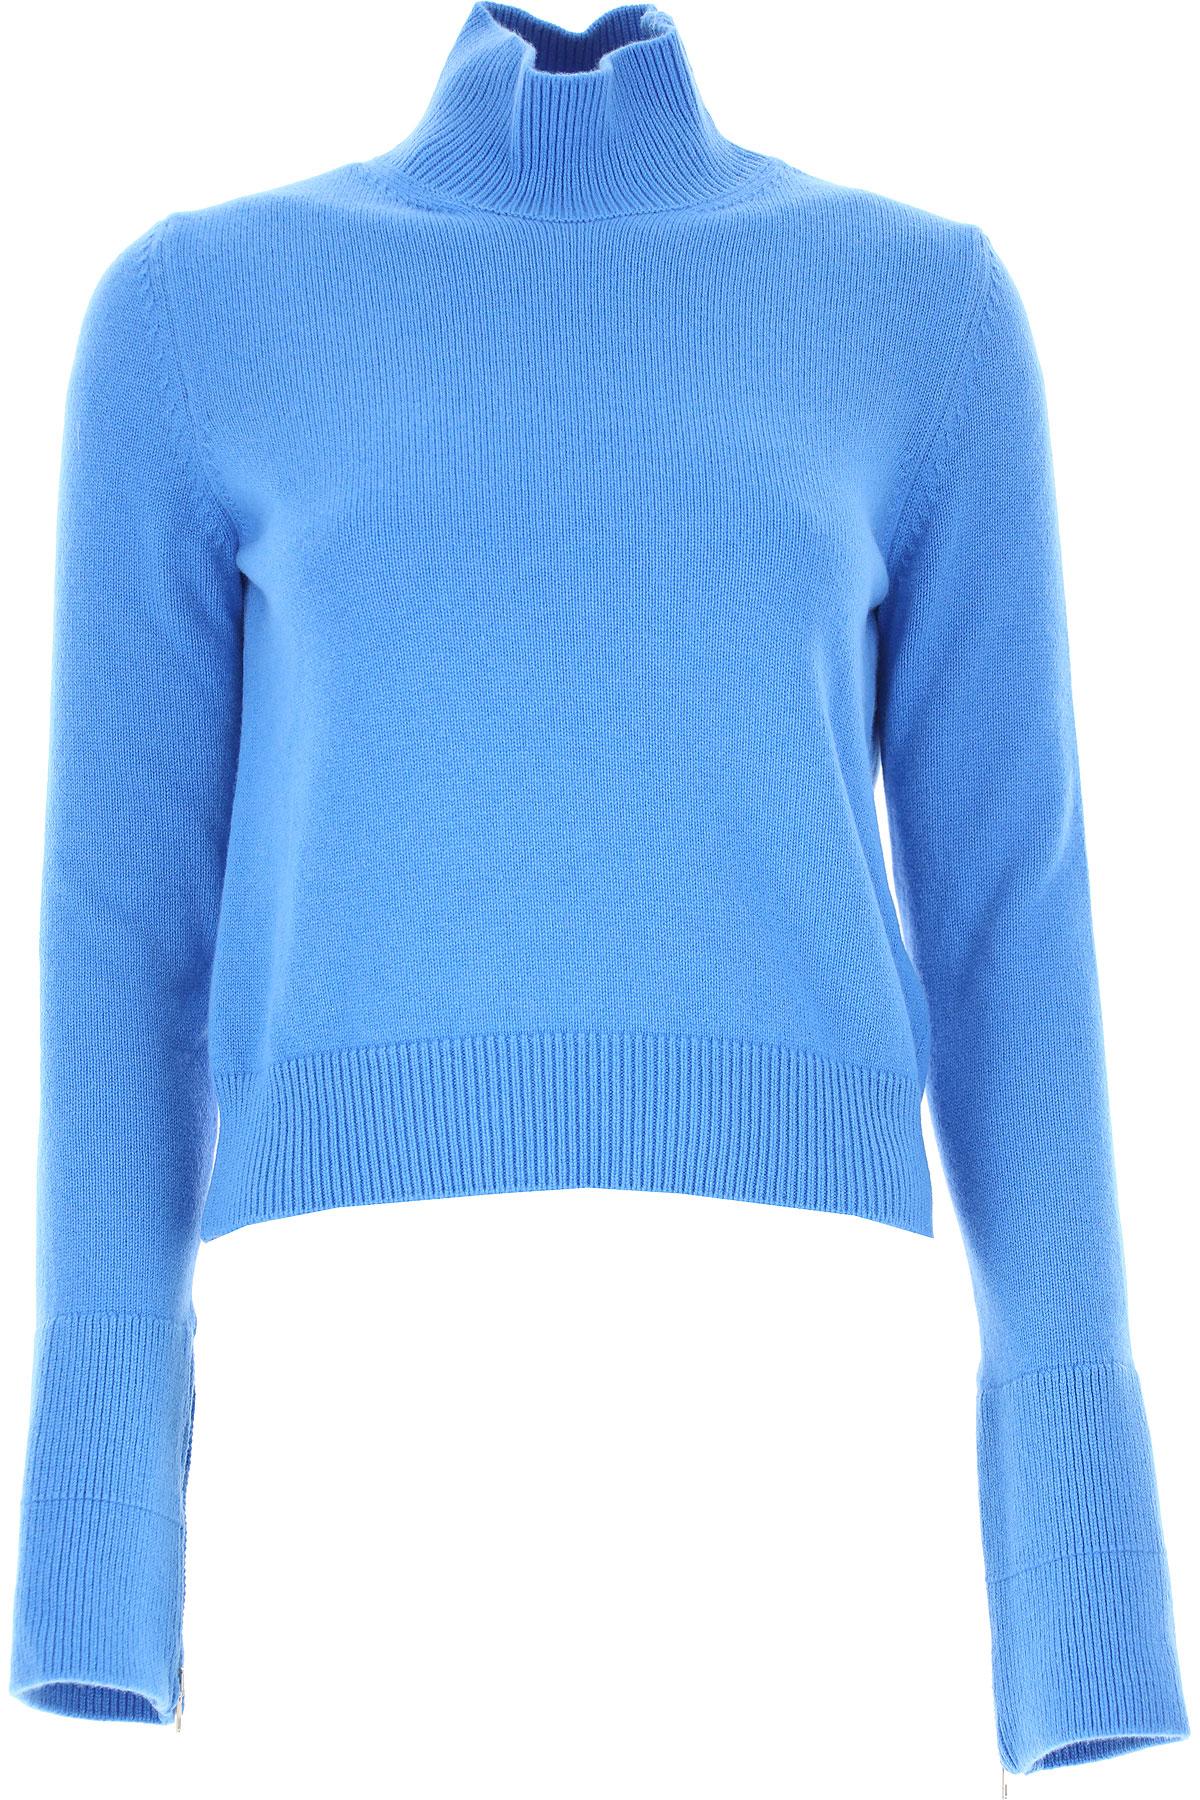 Image of MRZ Sweater for Women Jumper, Bright Light Sky Blue, Wool, 2017, 4 6